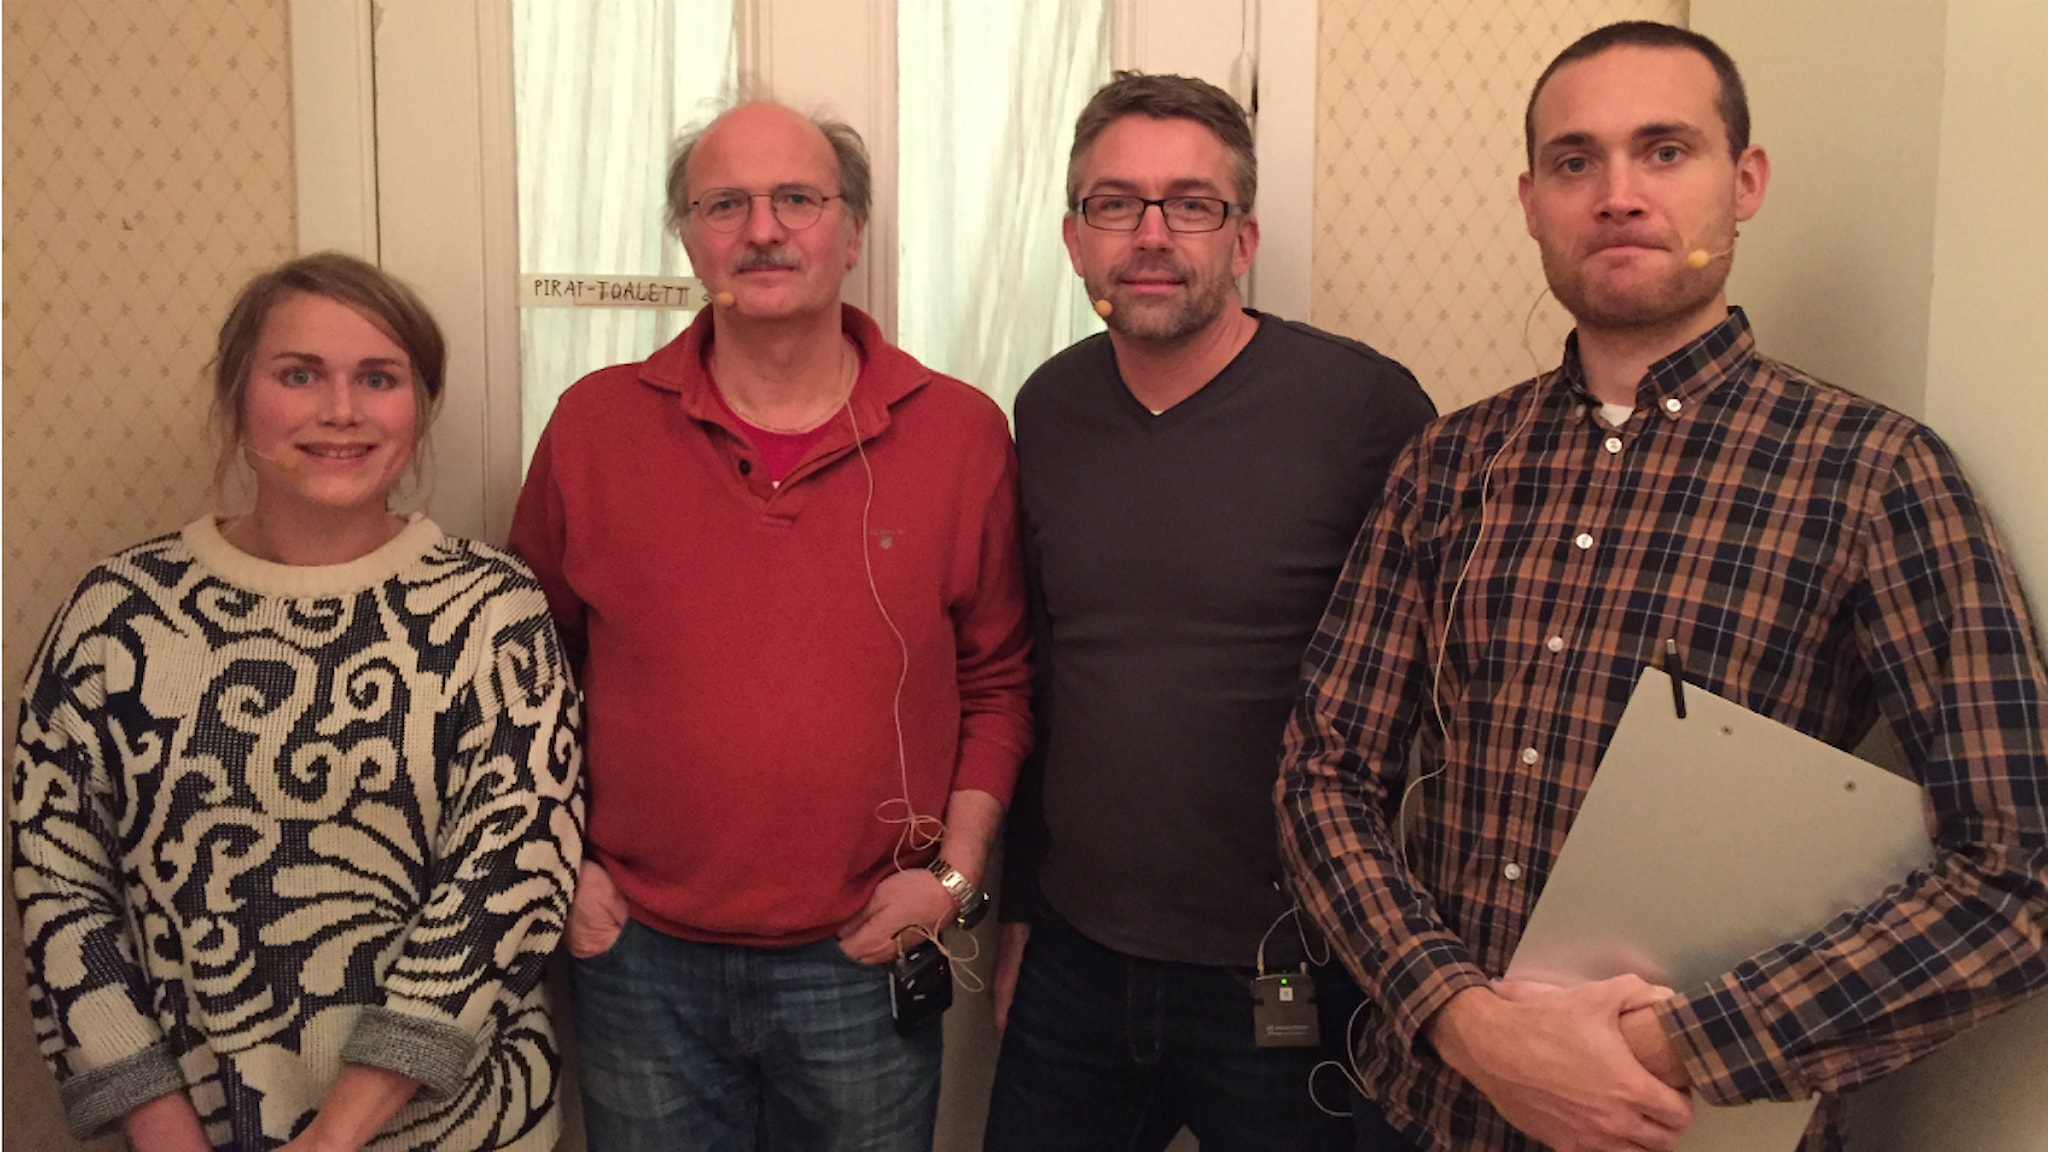 Karin Gyllenklev, Stefan Jansson, Tomas Brodin, Jesper Rönndahl. Foto: Nils Svennem Lundberg